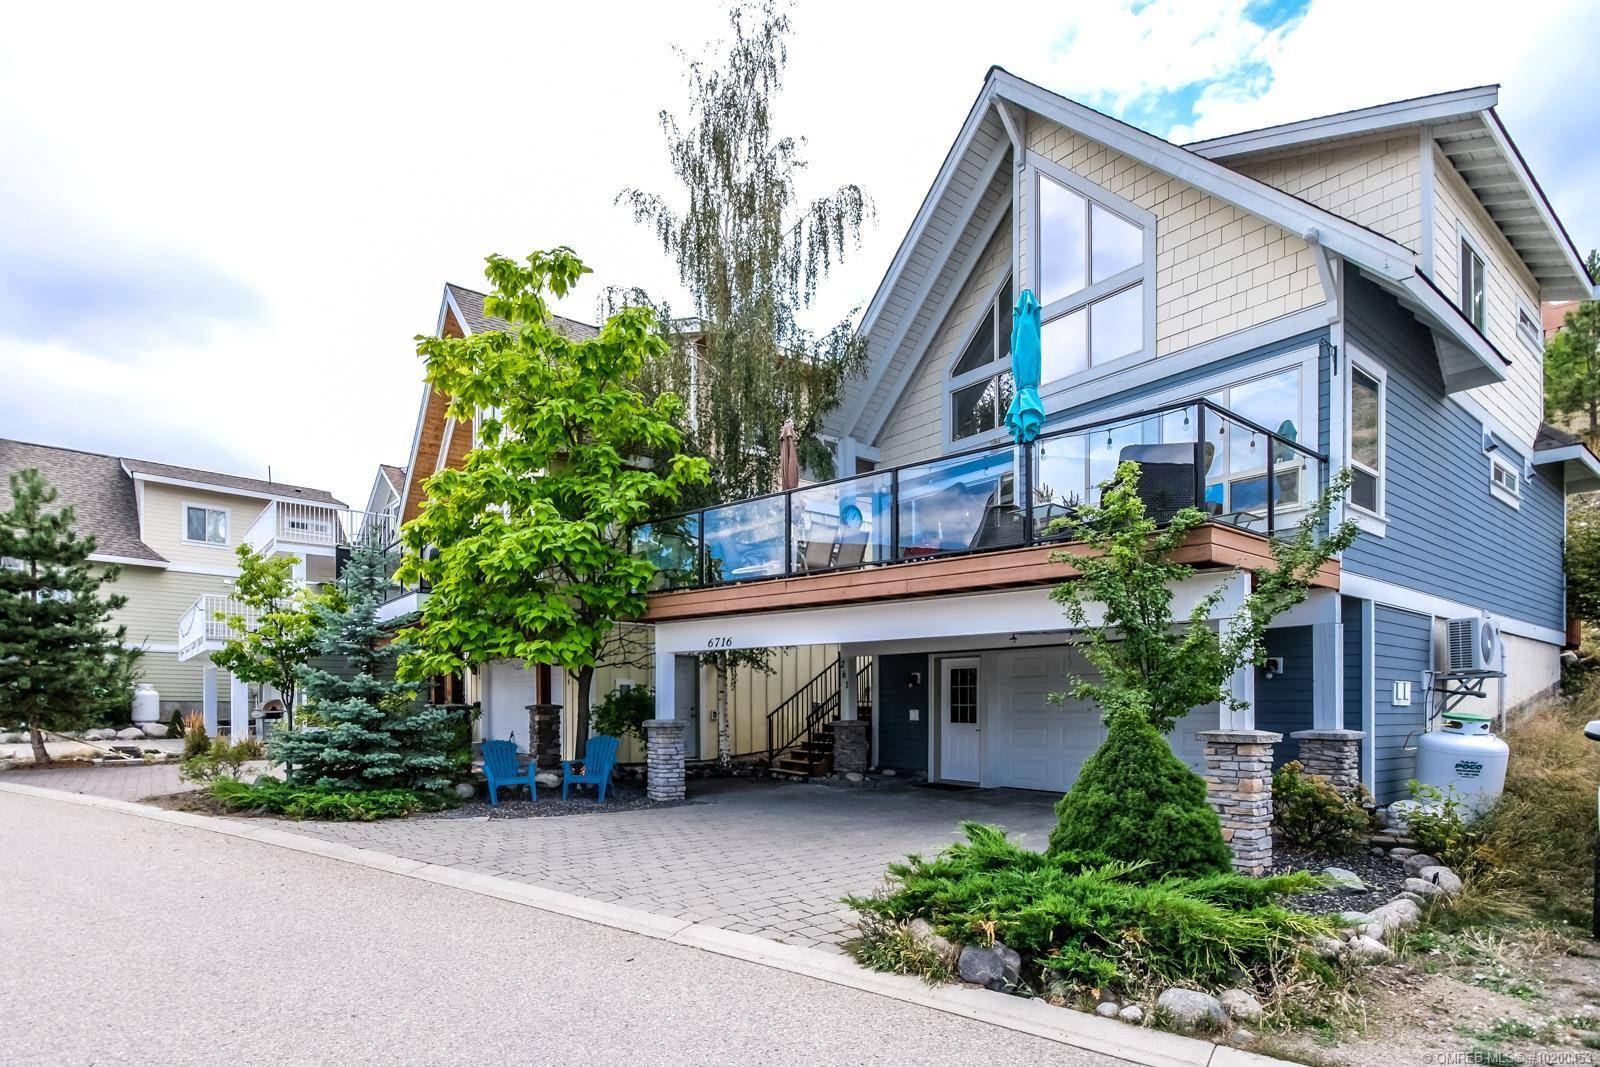 House for sale at 6716 La Palma Lp Unit 261 Kelowna British Columbia - MLS: 10200453